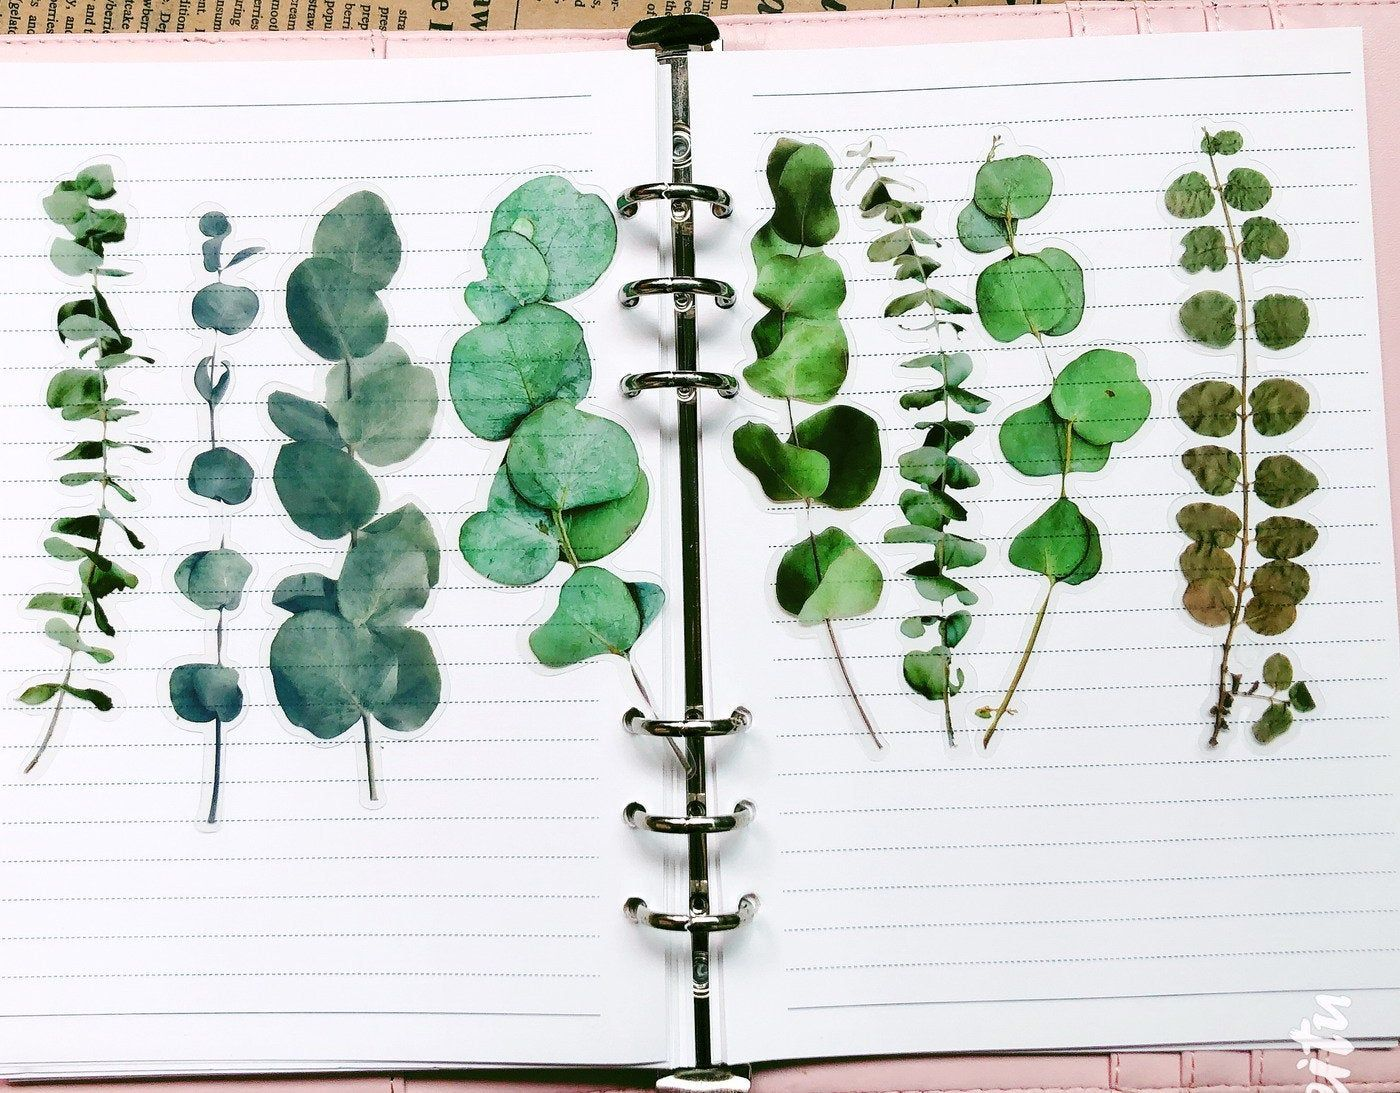 20 Pcs Eucalyptus Leaf Large Clear Sticker Botanicals Pvc Etsy In 2020 Clear Stickers Eucalyptus Leaves Filofax Stickers